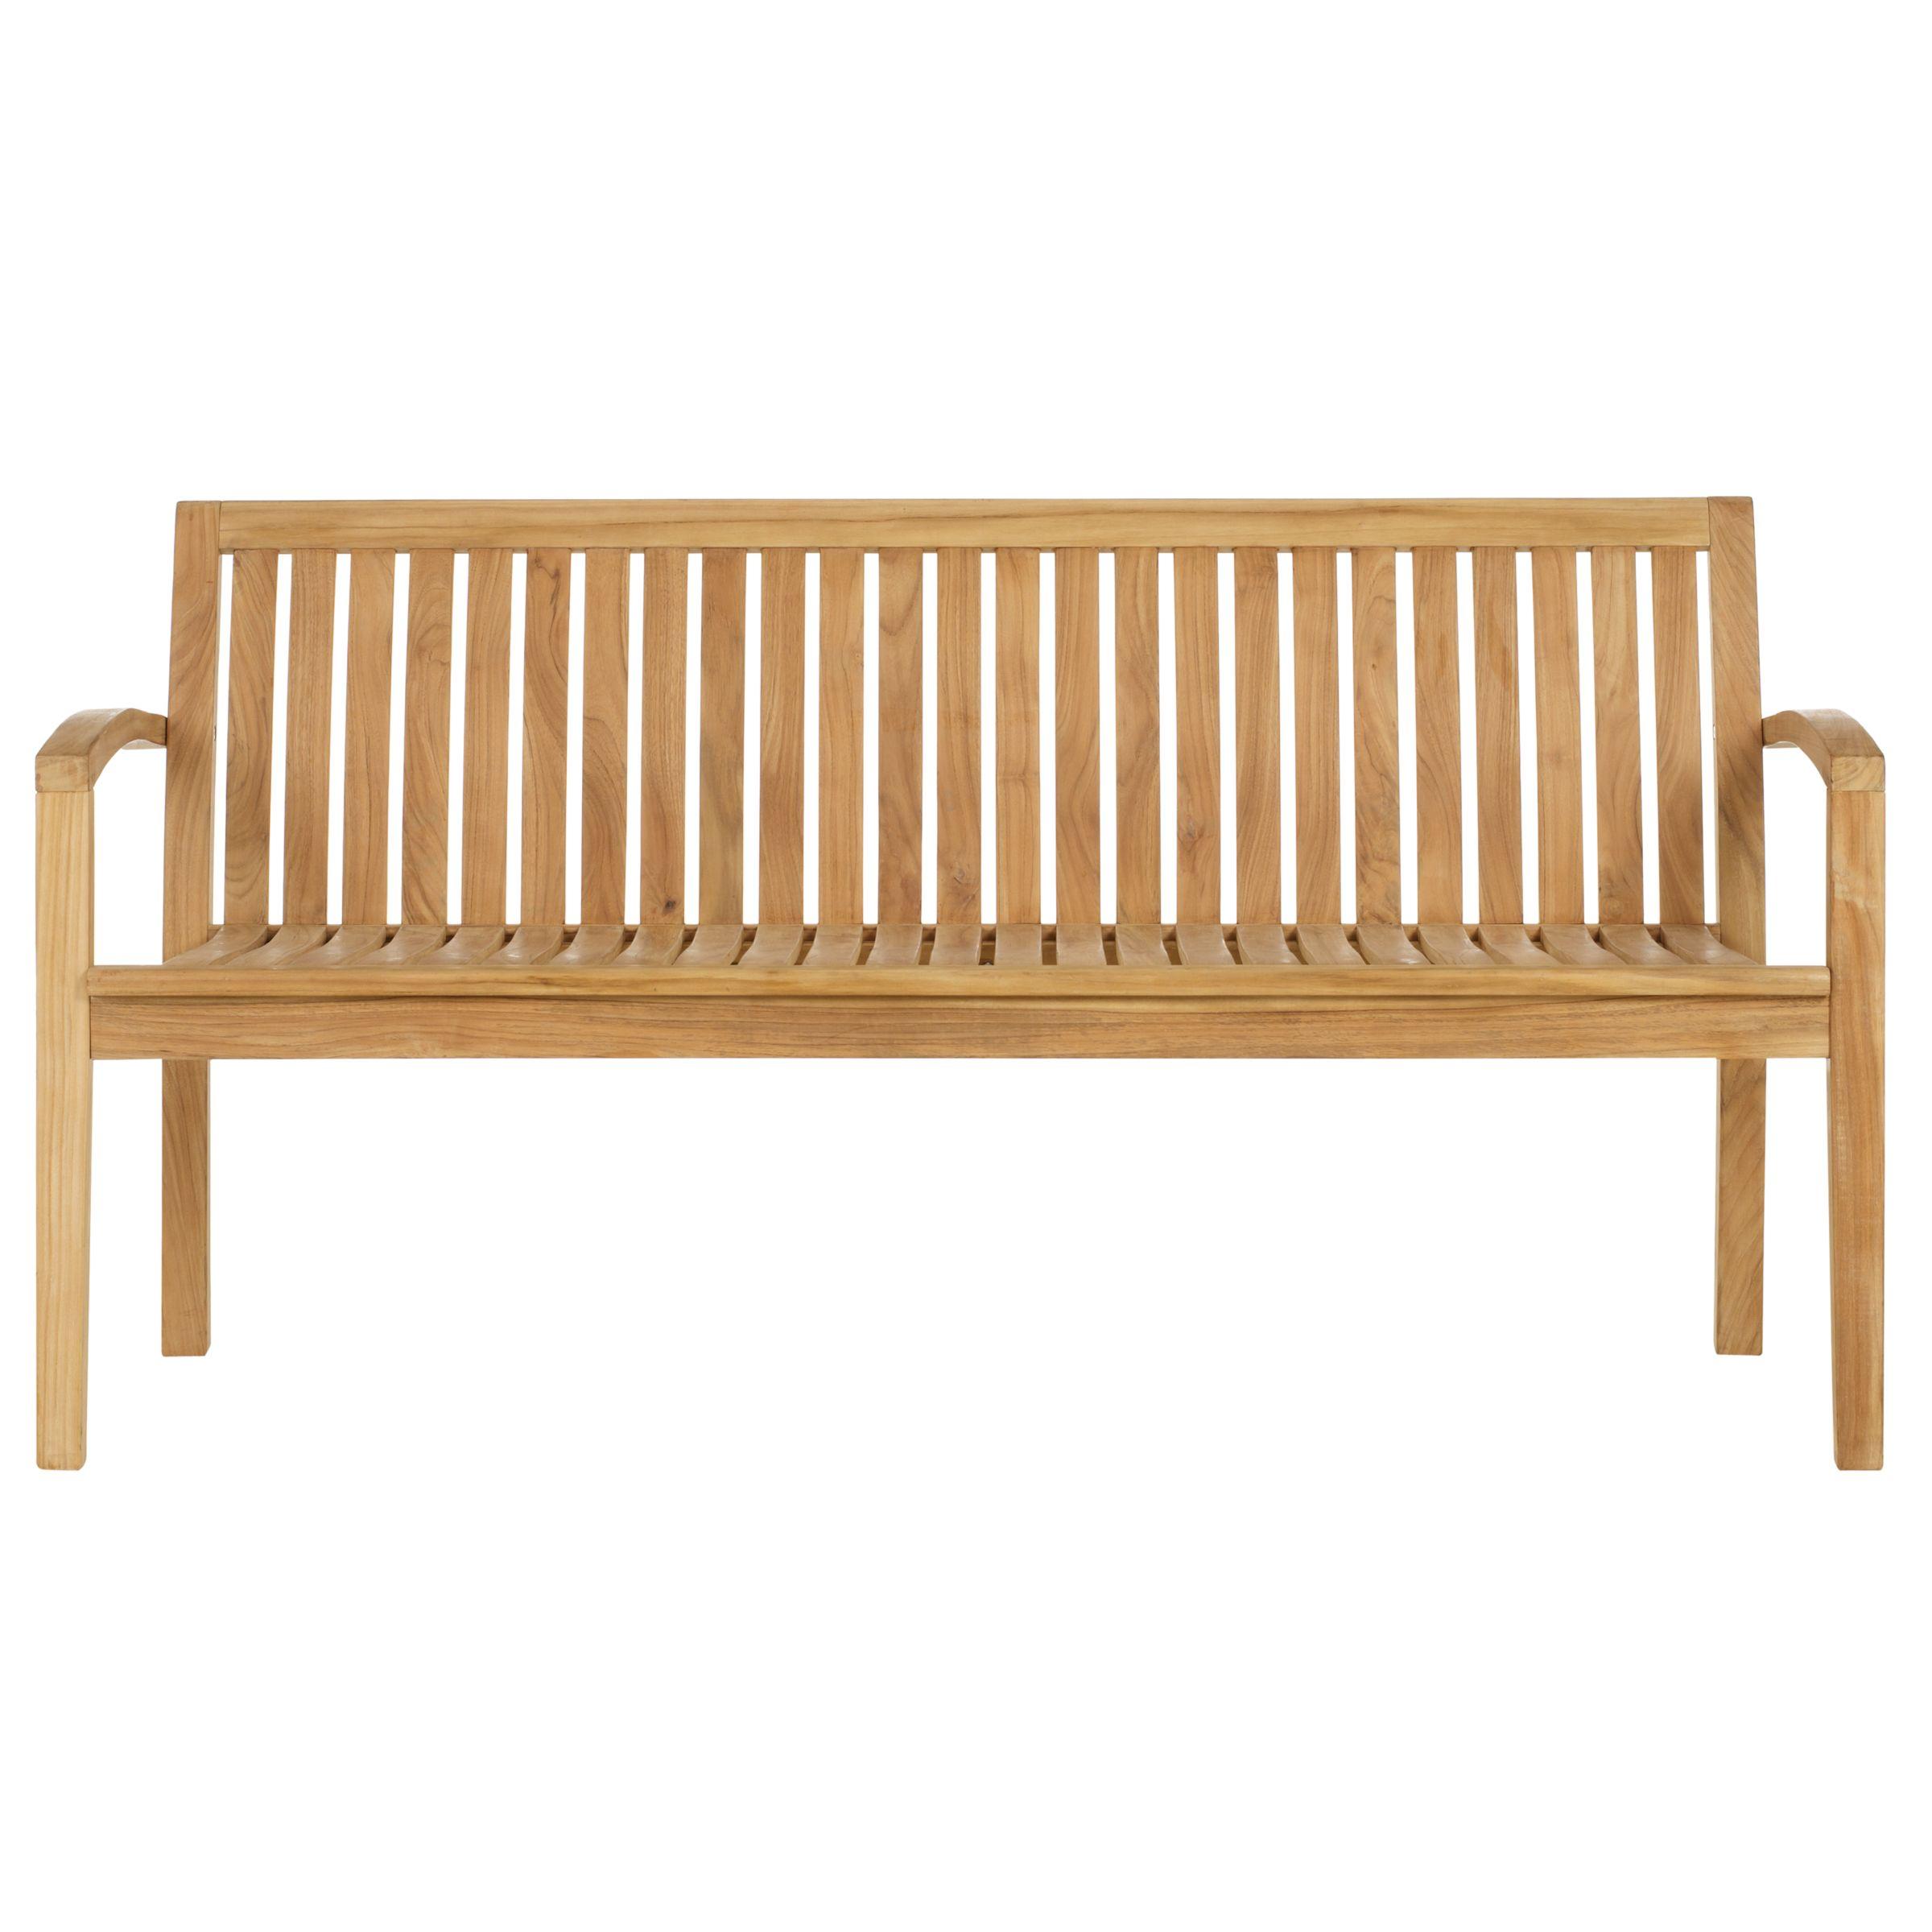 John Lewis Austin Garden Bench, 5ft